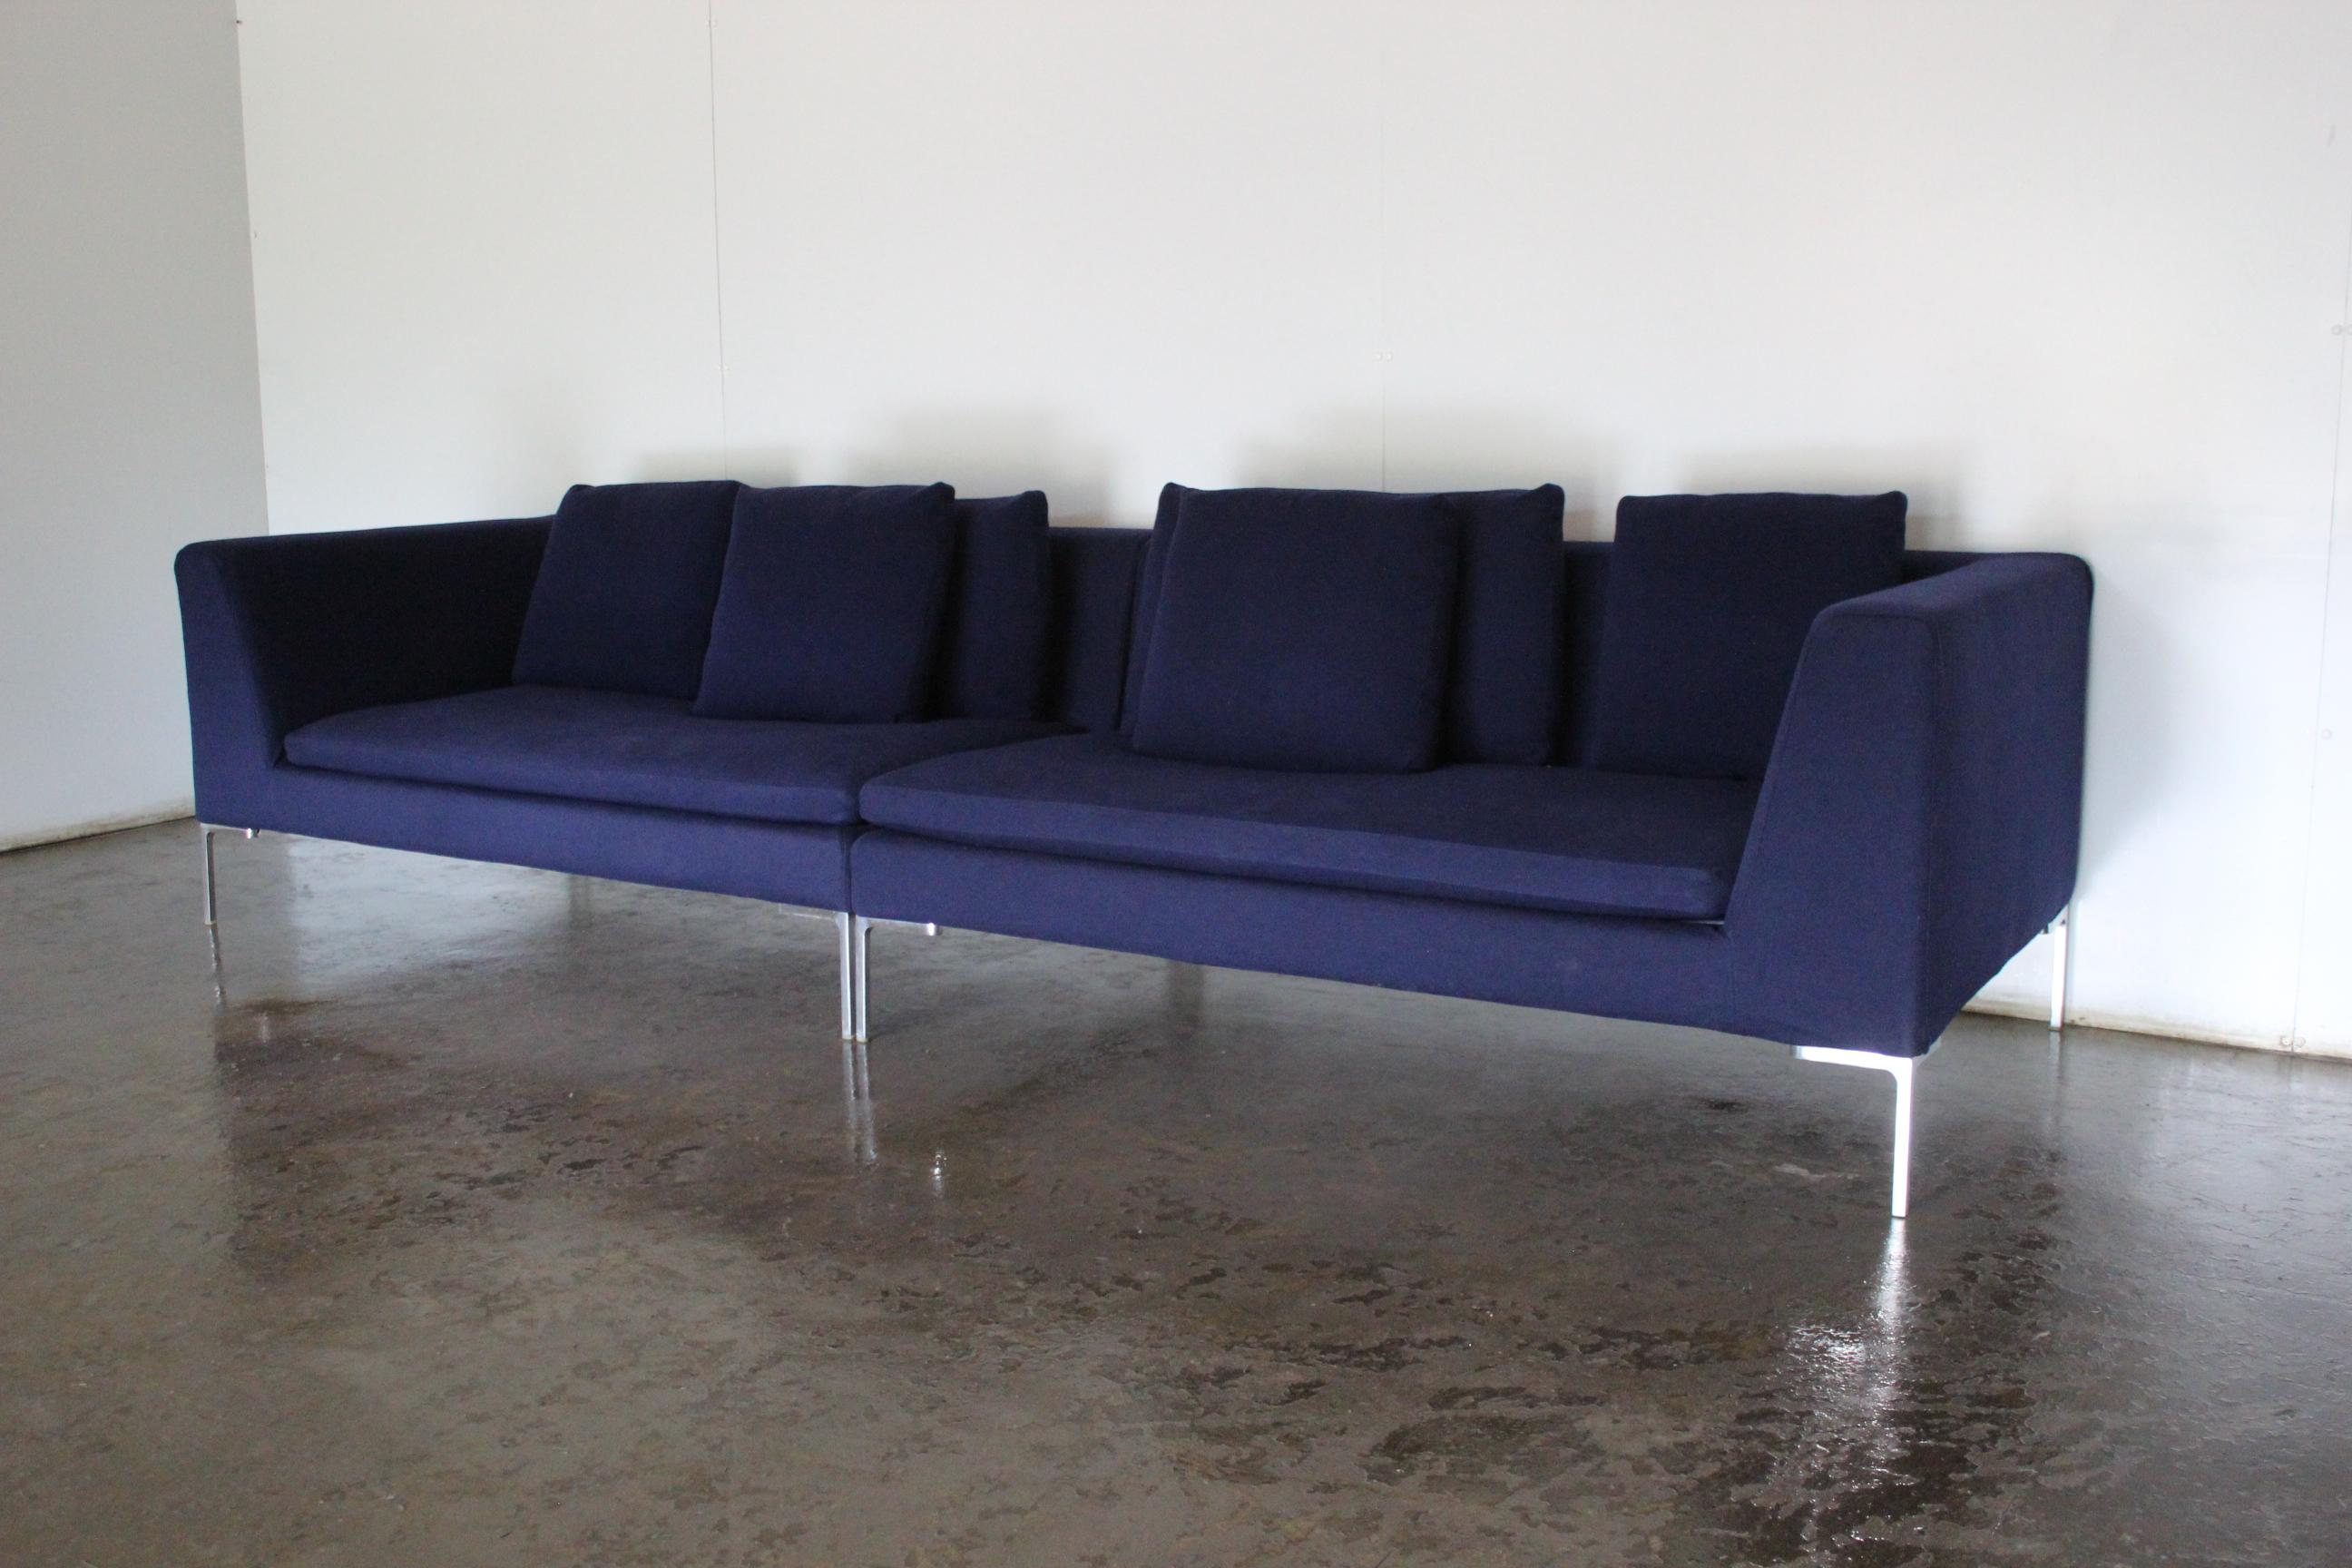 Amazing Superb Bb Italia Charles Sectional 4 Seat Sofa In Navy Ibusinesslaw Wood Chair Design Ideas Ibusinesslaworg